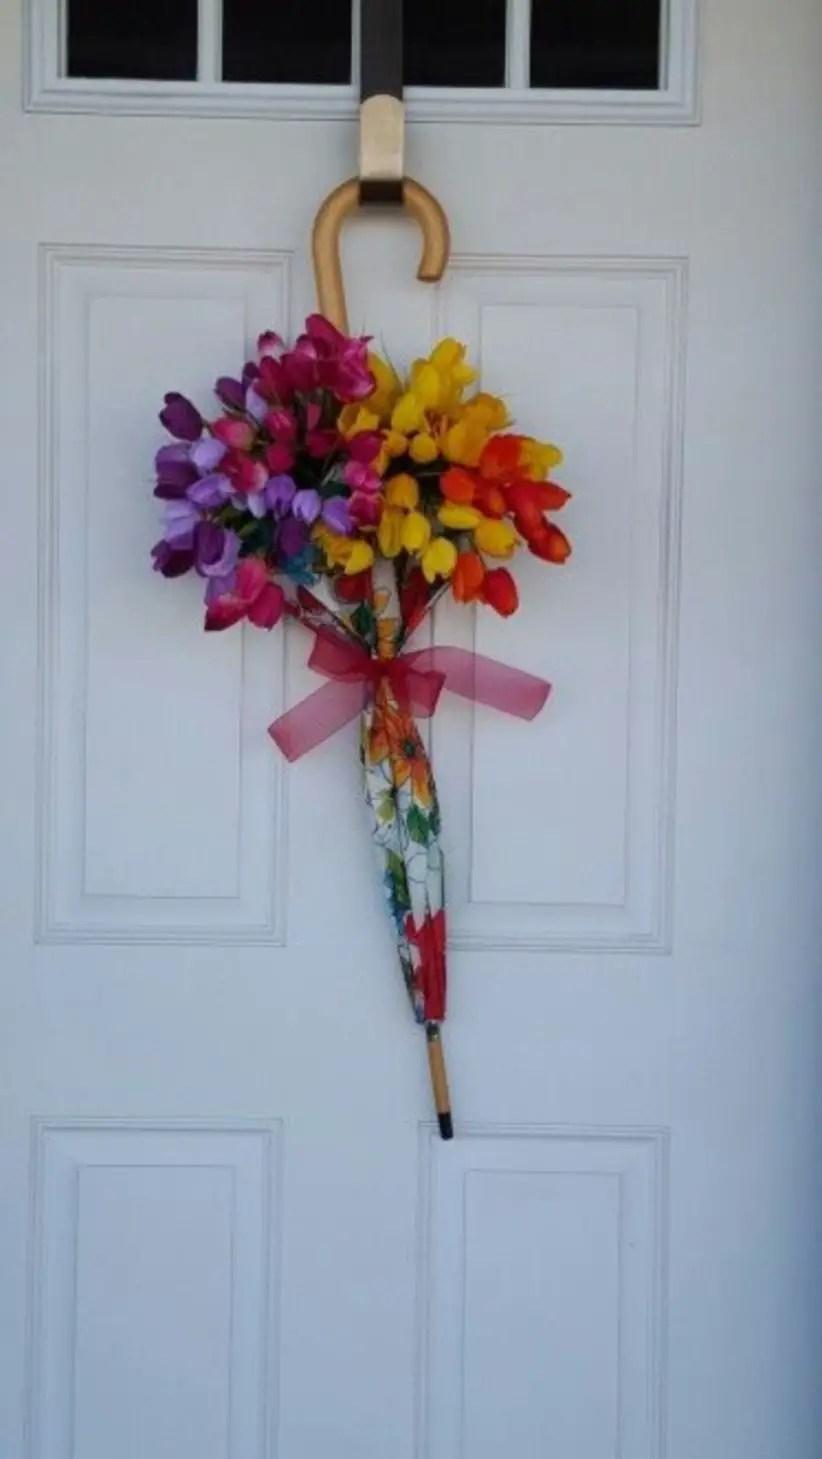 Beautiful decor ideas to hang on your door that aren't wreaths 31